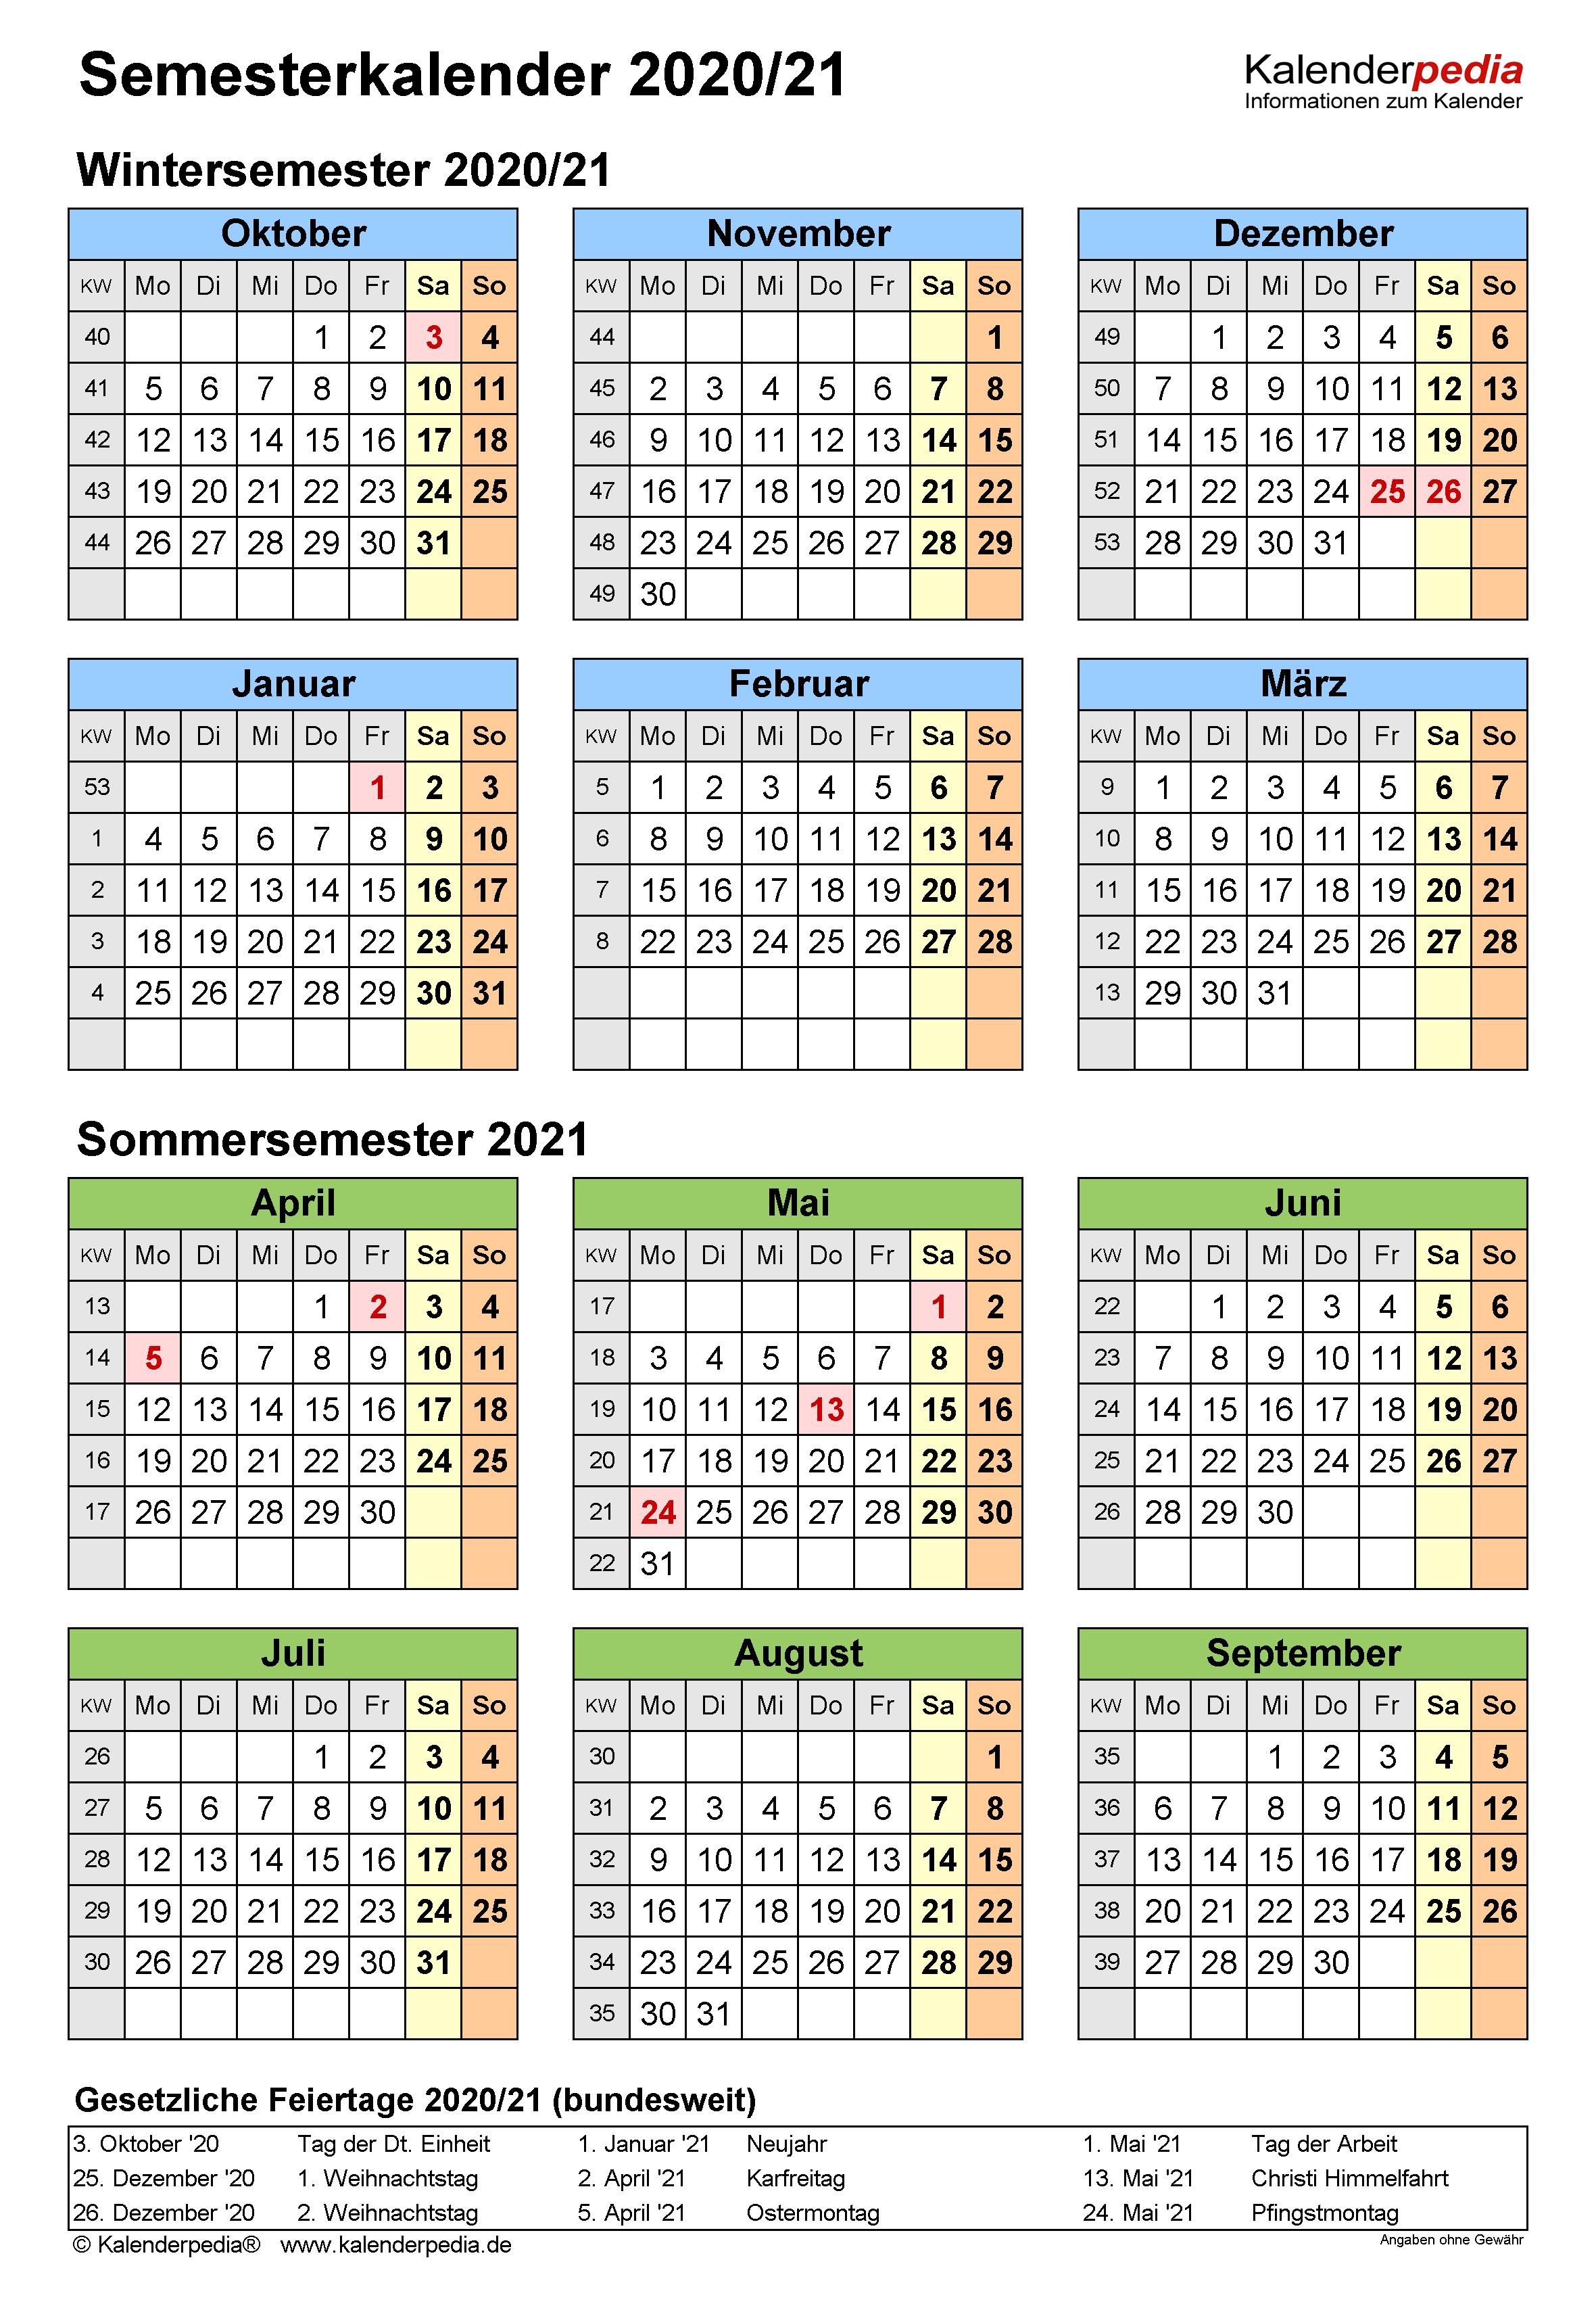 Wintersemester 2021